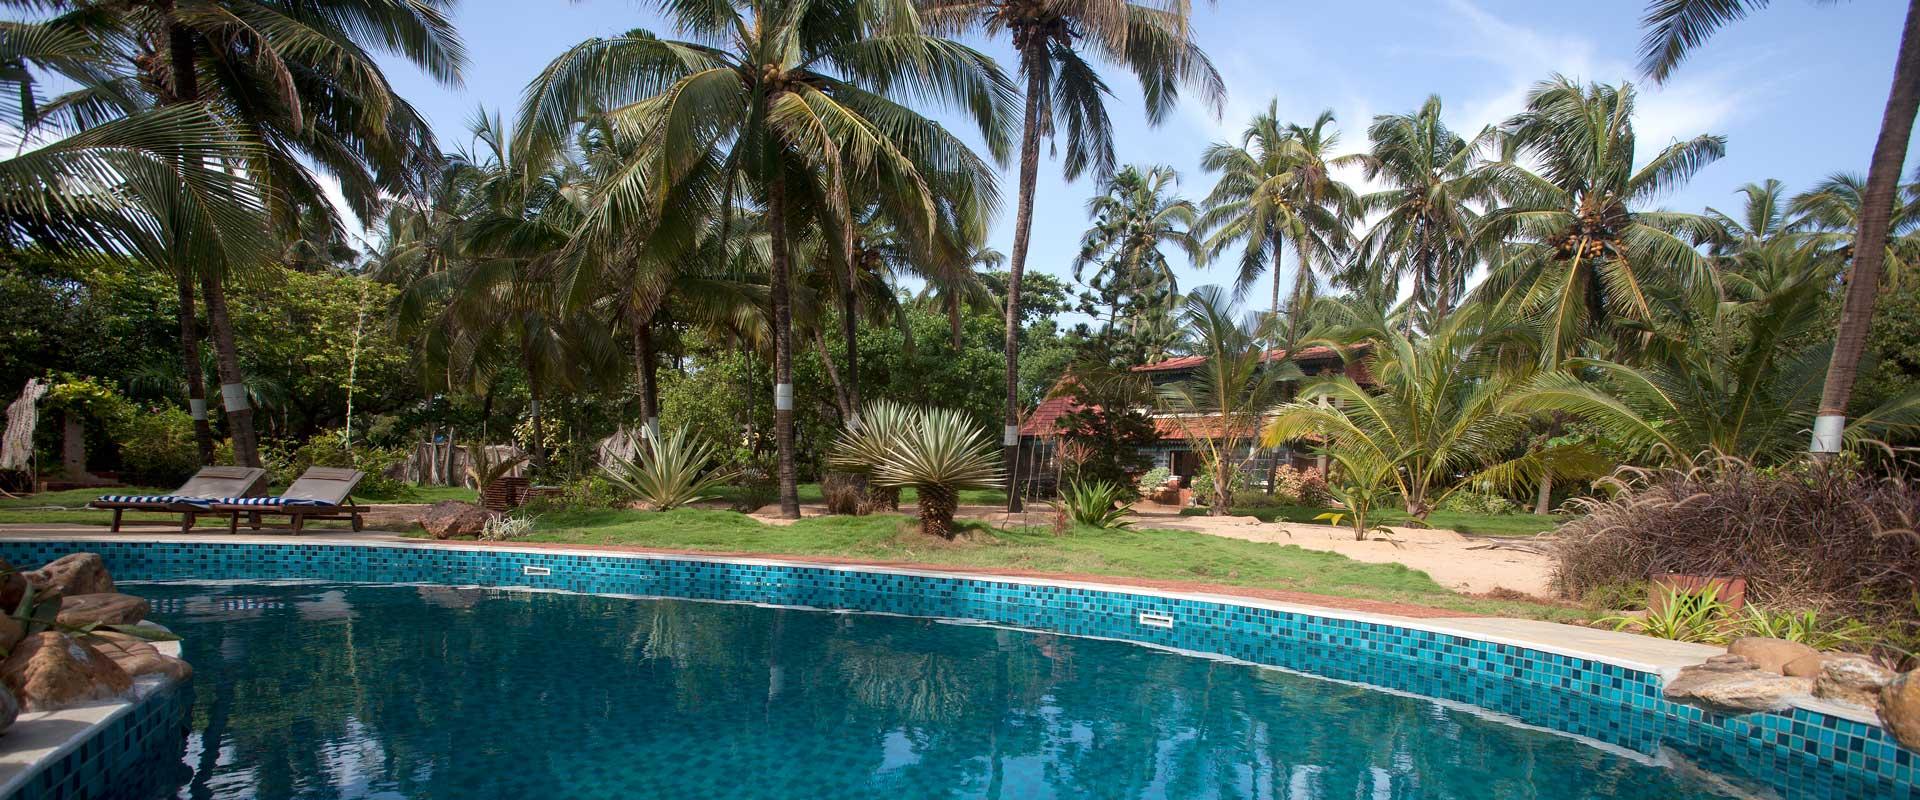 Rockheart Goa – Property